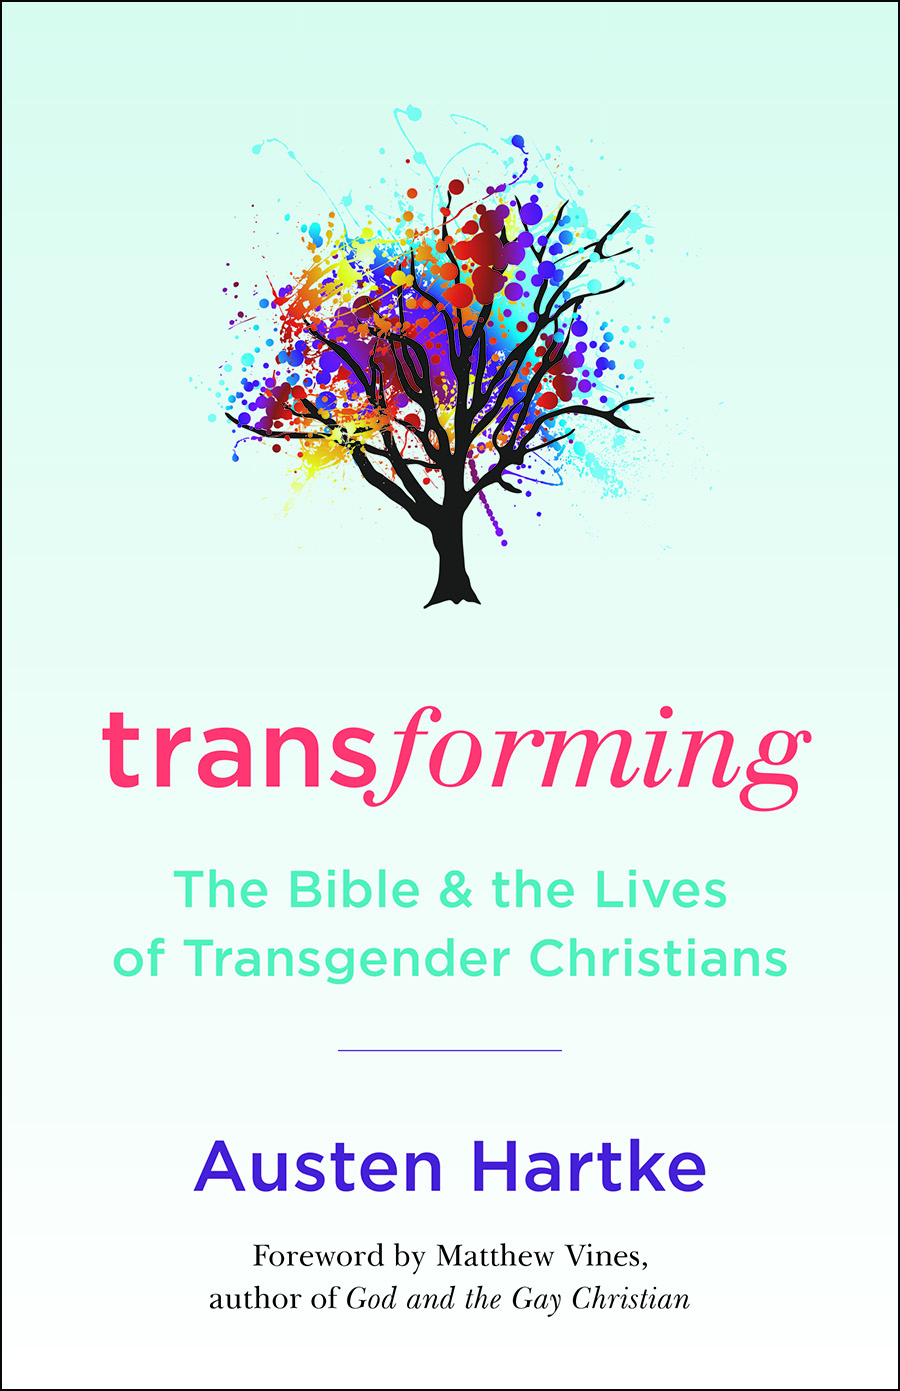 Transforming-Book-Cover-Print-Media.jpg